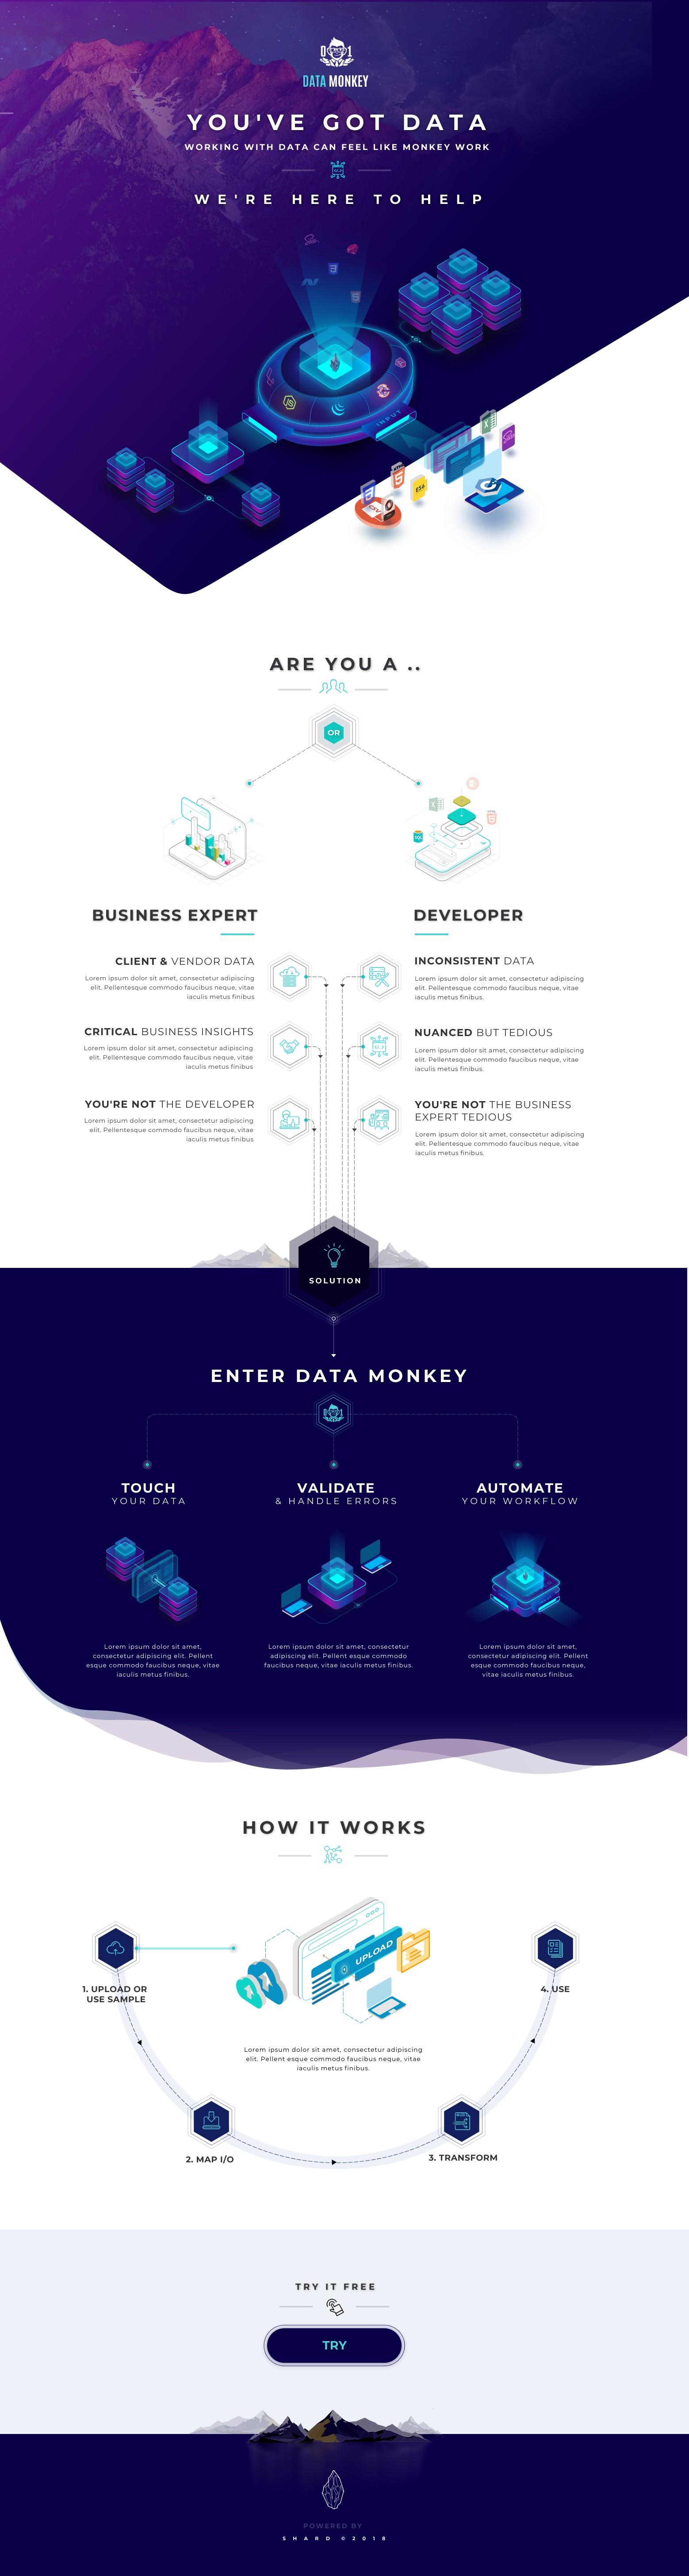 Design badass landing page for enterprise-scale data transformation platform